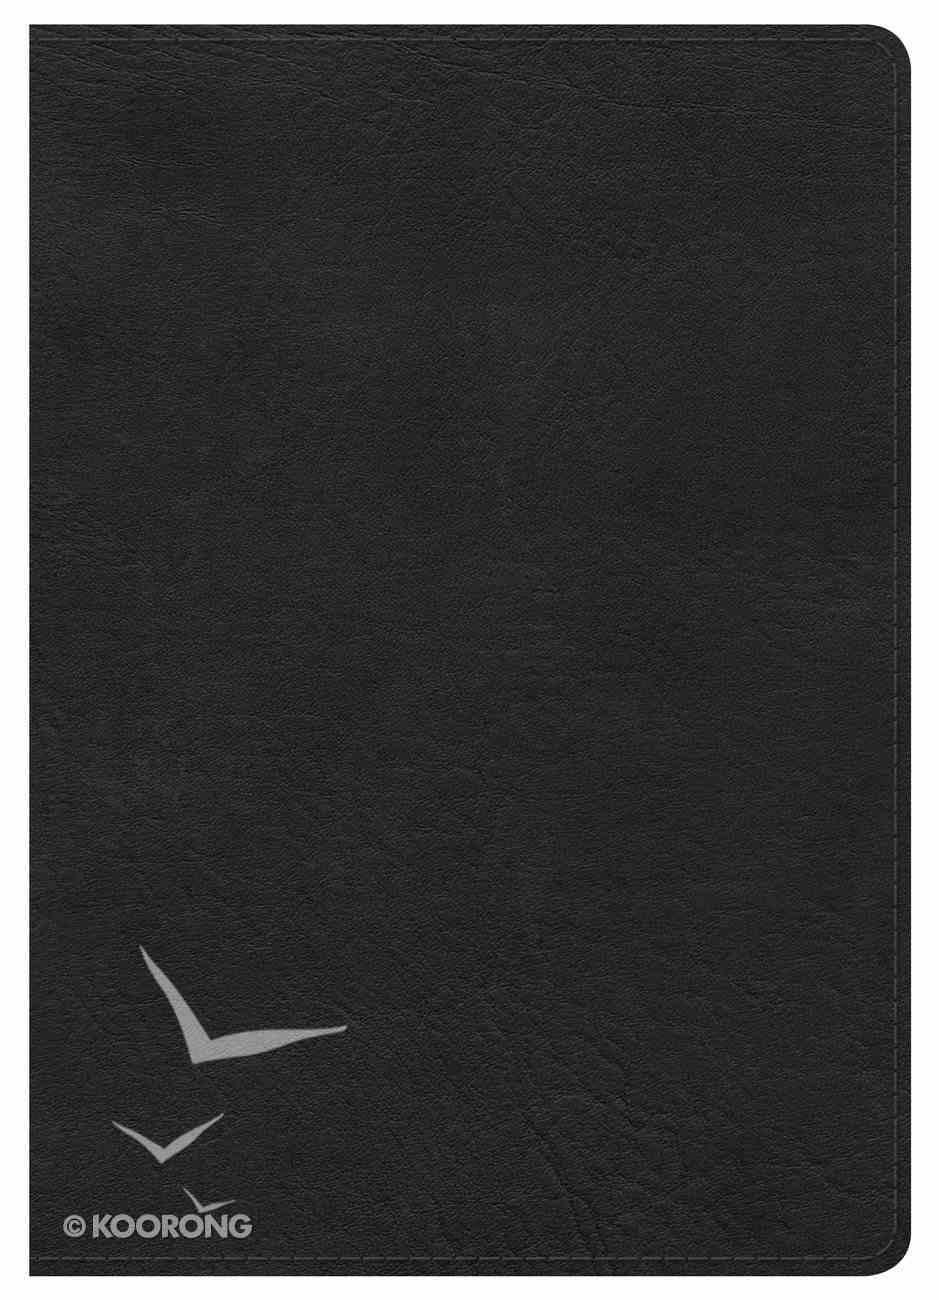 NKJV Large Print Compact Reference Bible Black Imitation Leather